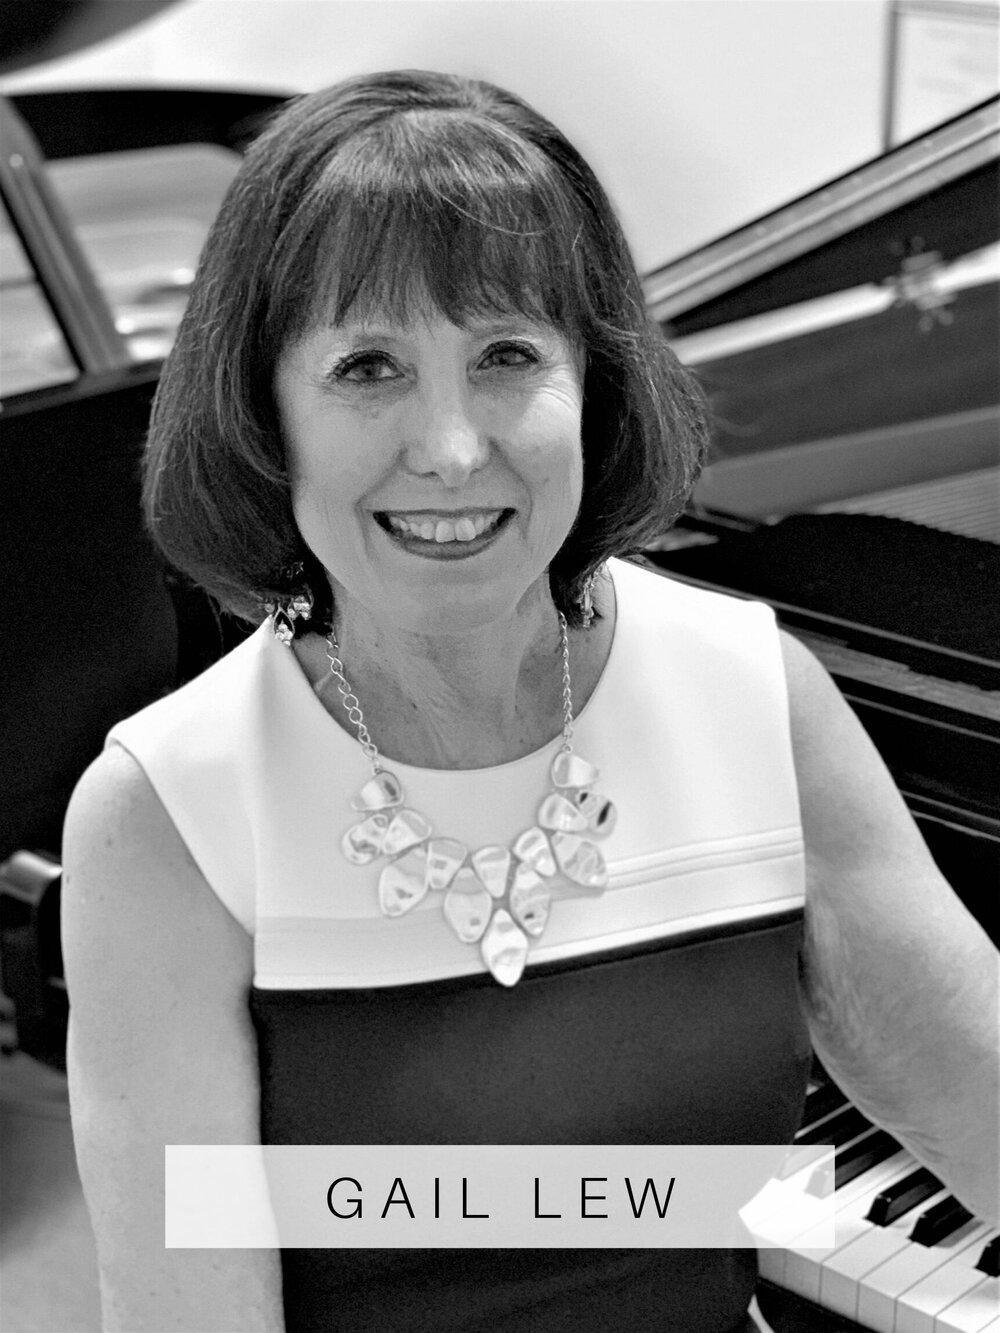 Gail Lew